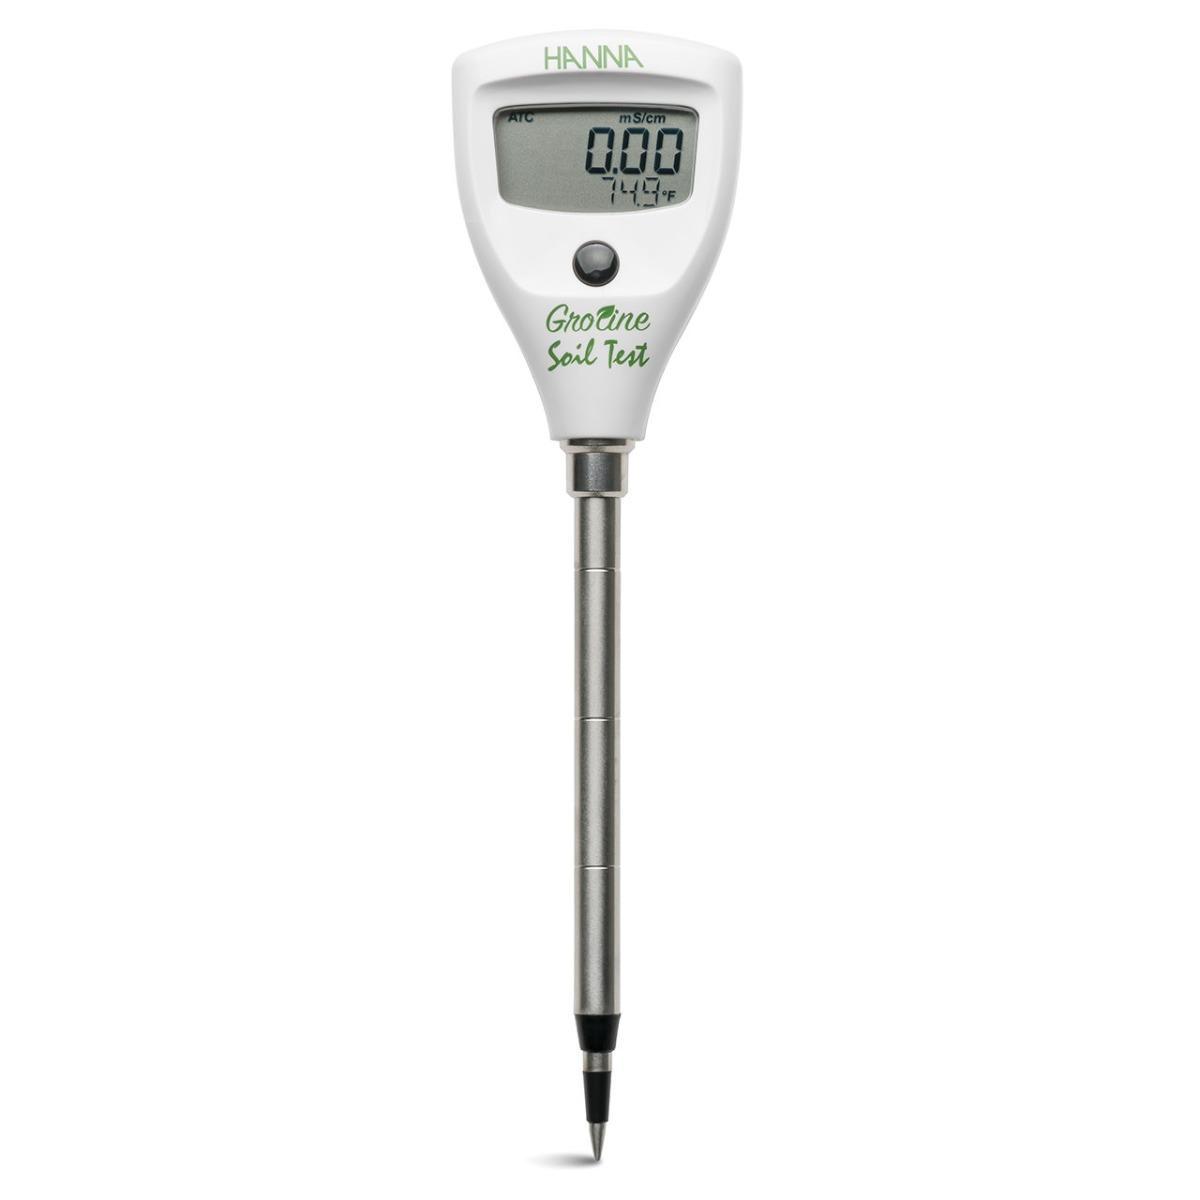 Tester de CE Directo en Suelo Soil Test™ - HI98331